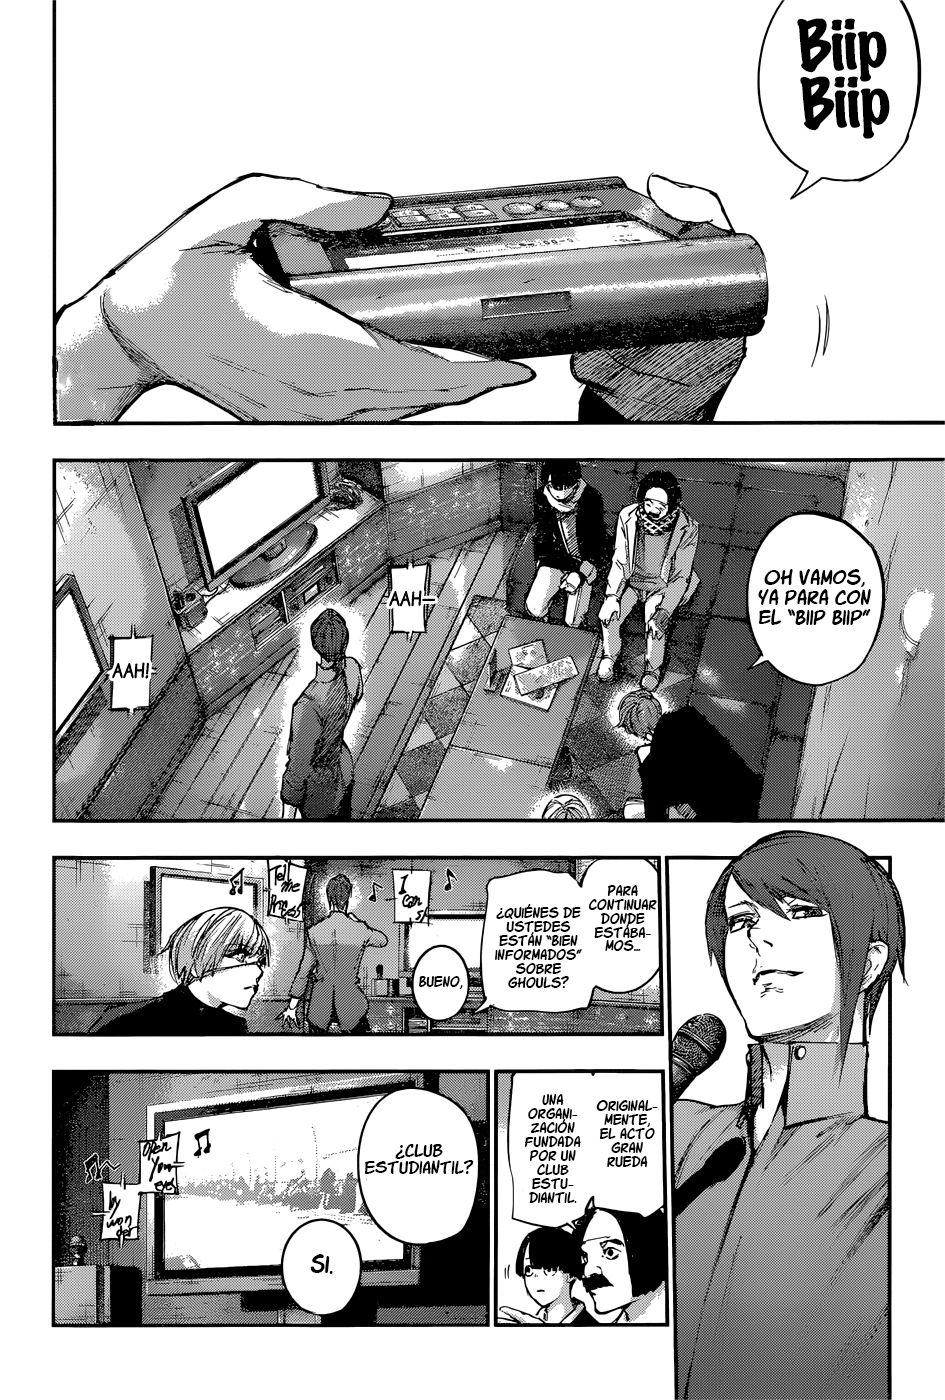 http://c5.ninemanga.com/es_manga/pic2/59/59/523533/64260482b26e2c7bf427e331781c00b0.jpg Page 5